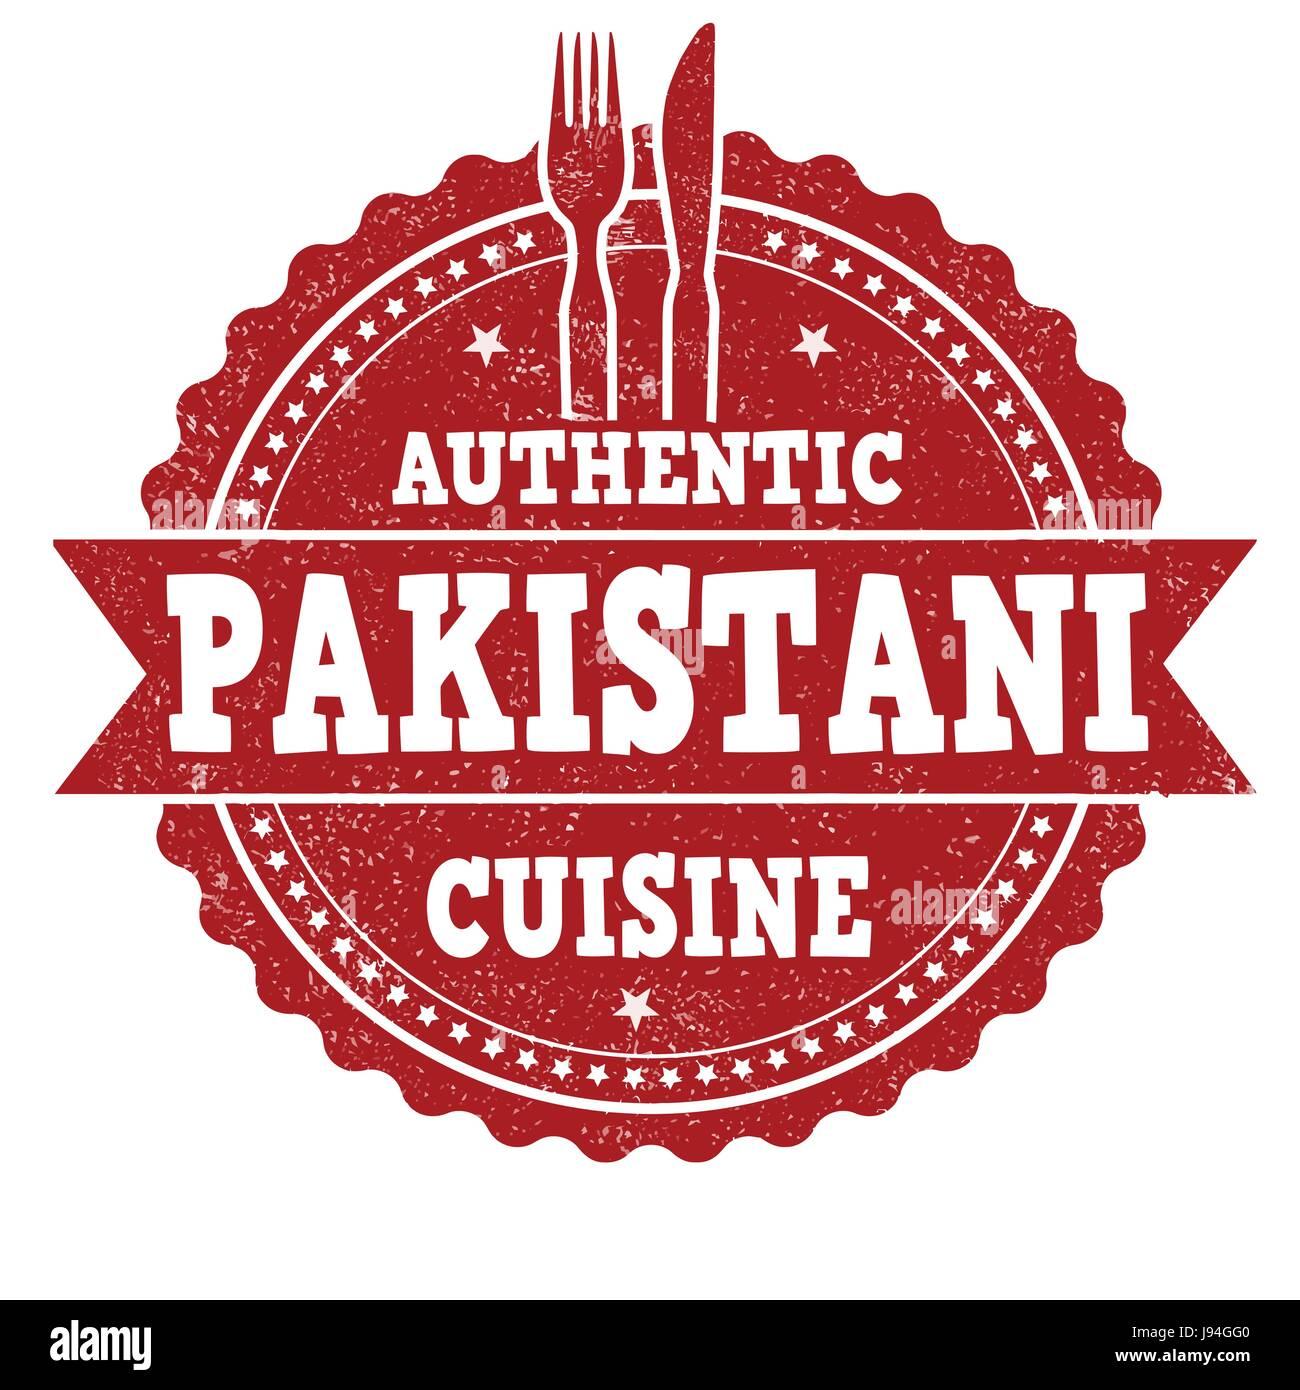 Pakistani cuisine grunge rubber stamp on white background, vector illustration - Stock Image